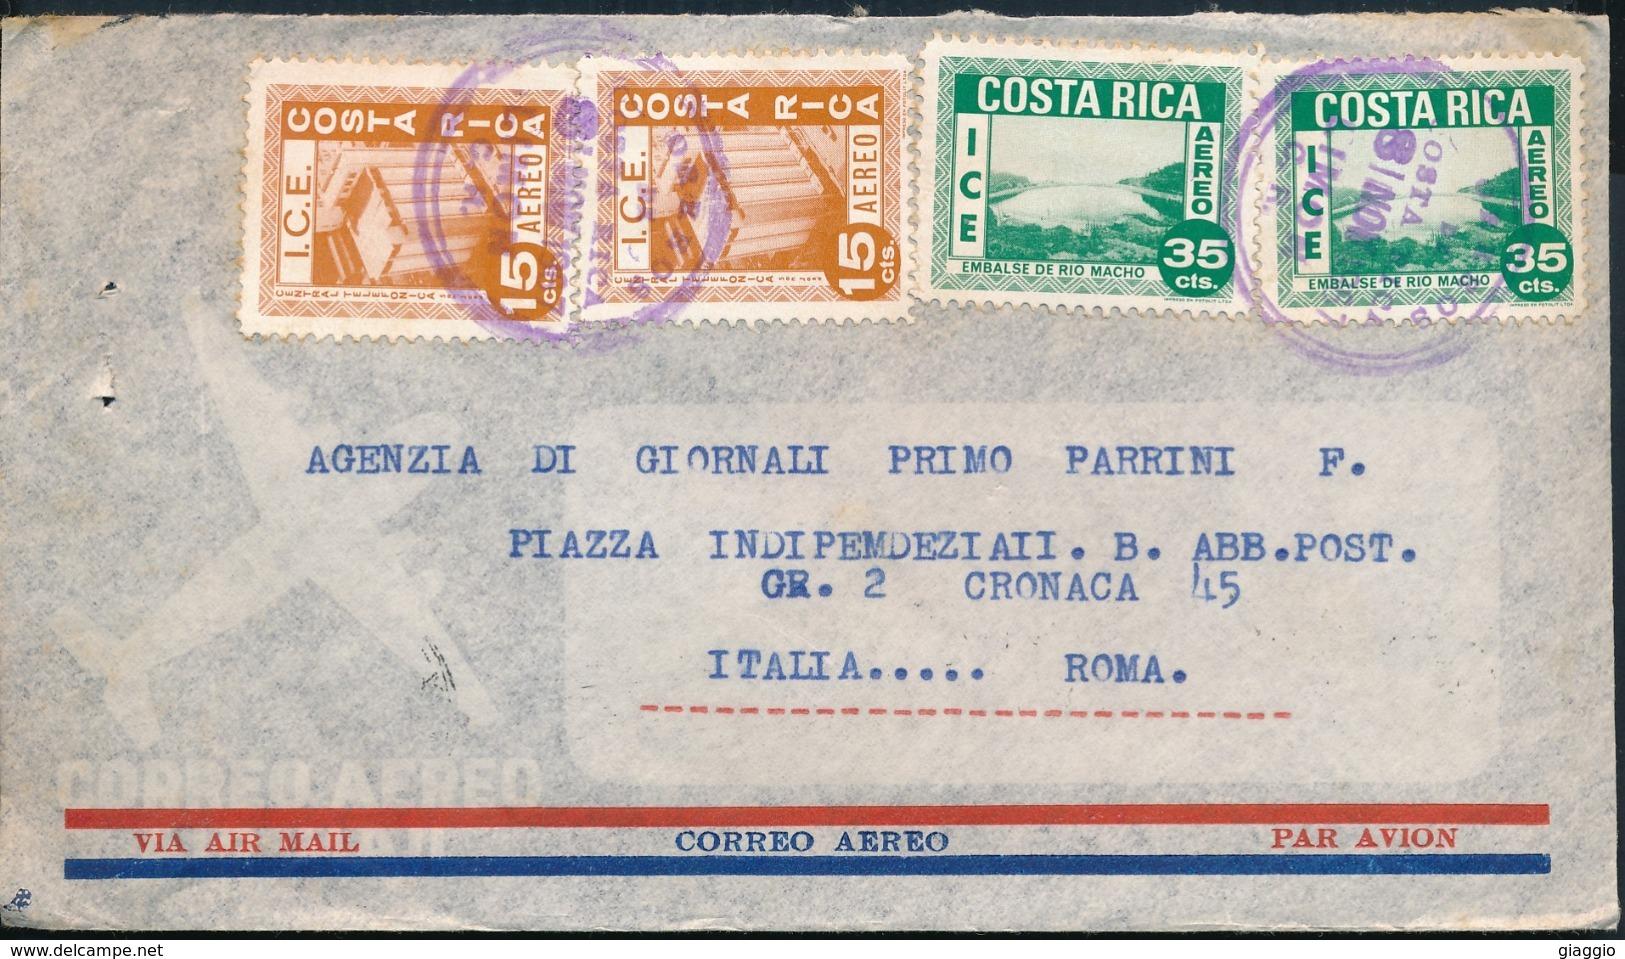 °°° POSTAL HISTORY COSTA RICA - 1967 °°° - Costa Rica